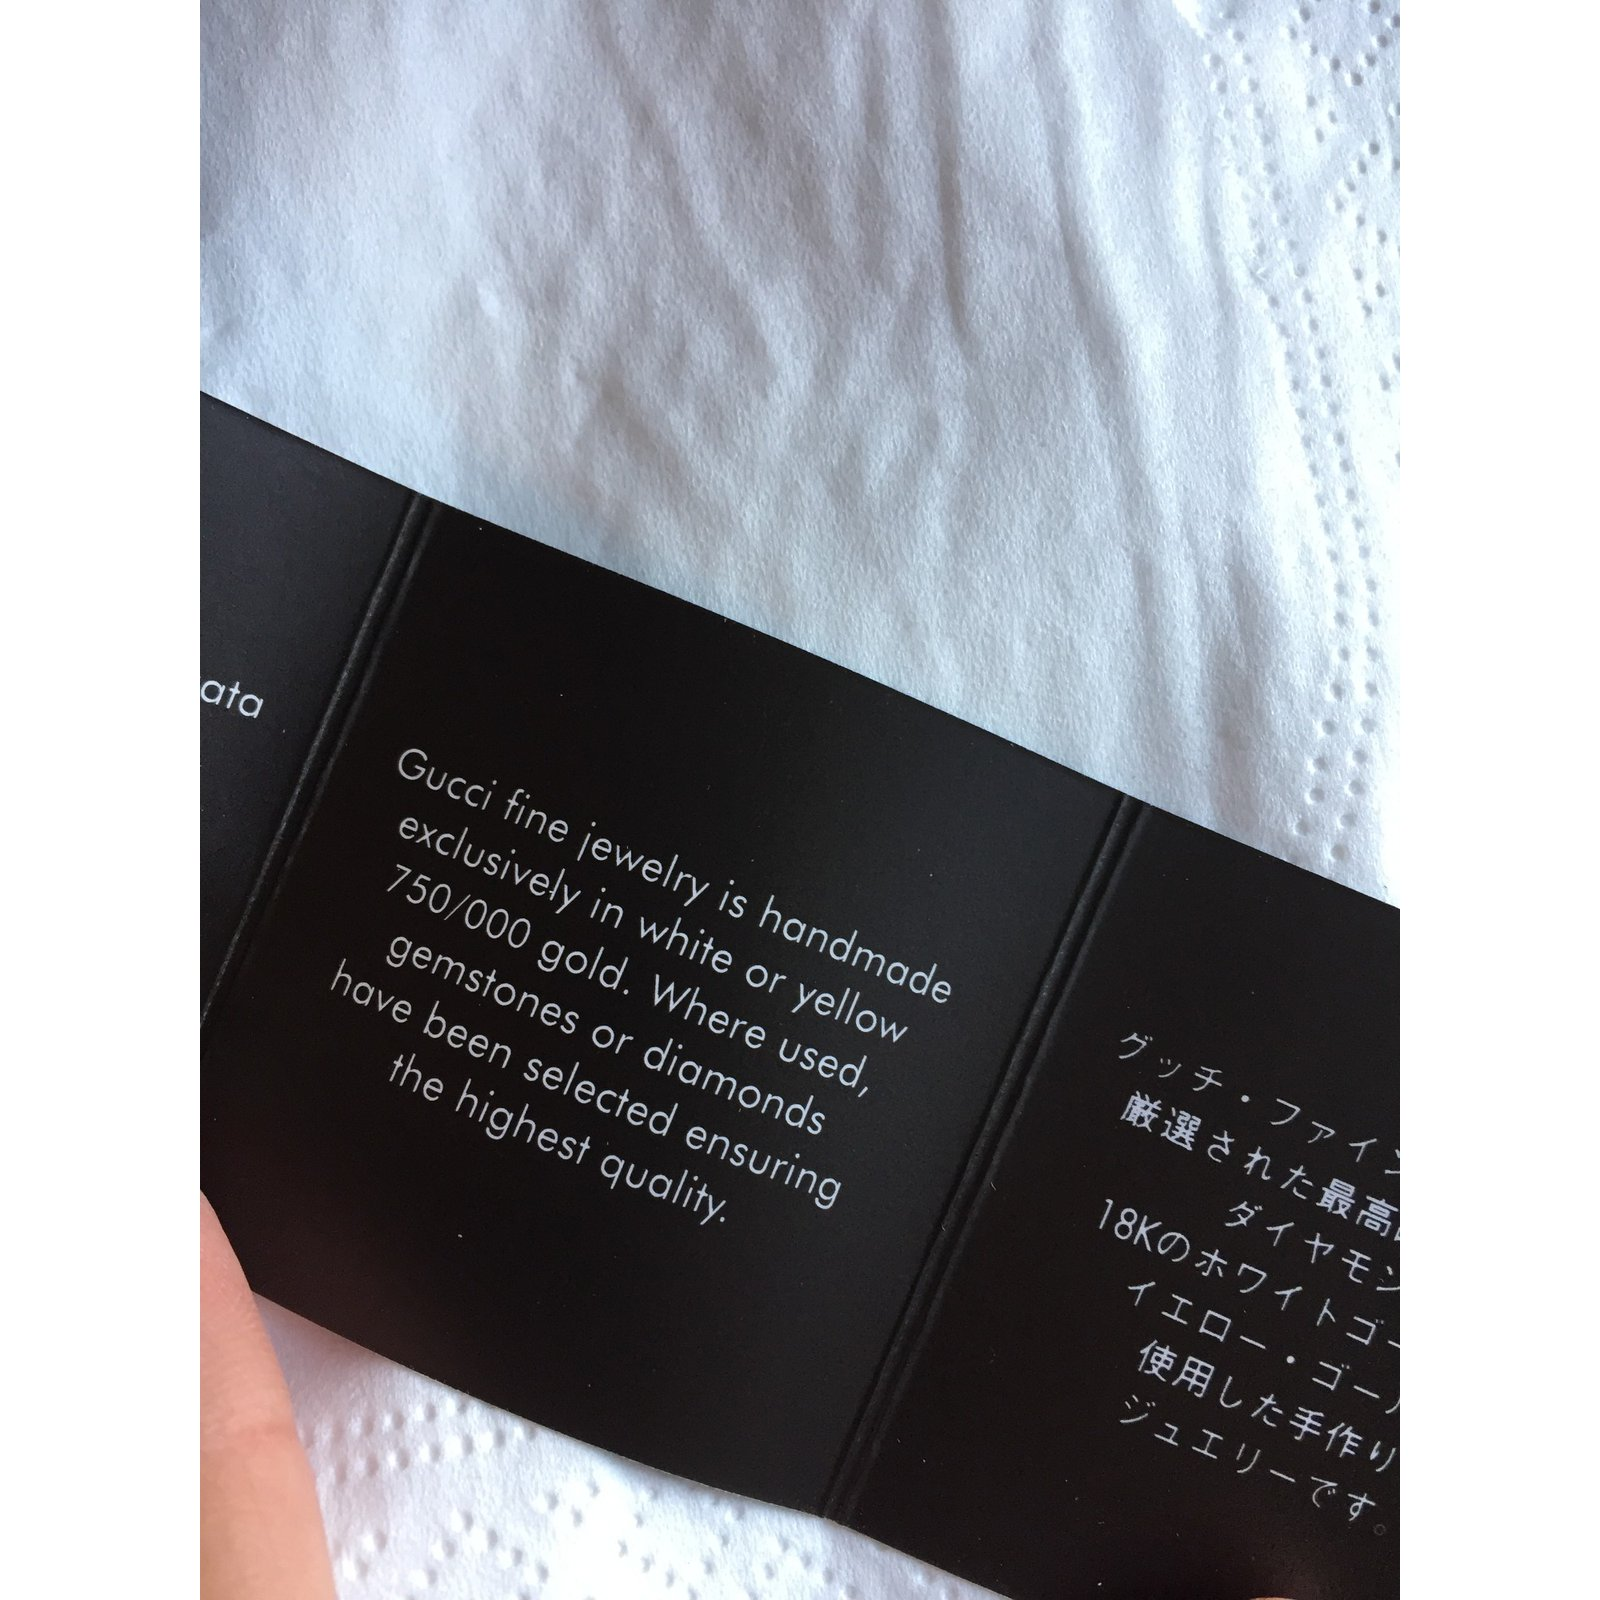 2b9c466814488e Gucci Icon Ring Rings Gold Golden ref.59457 - Joli Closet